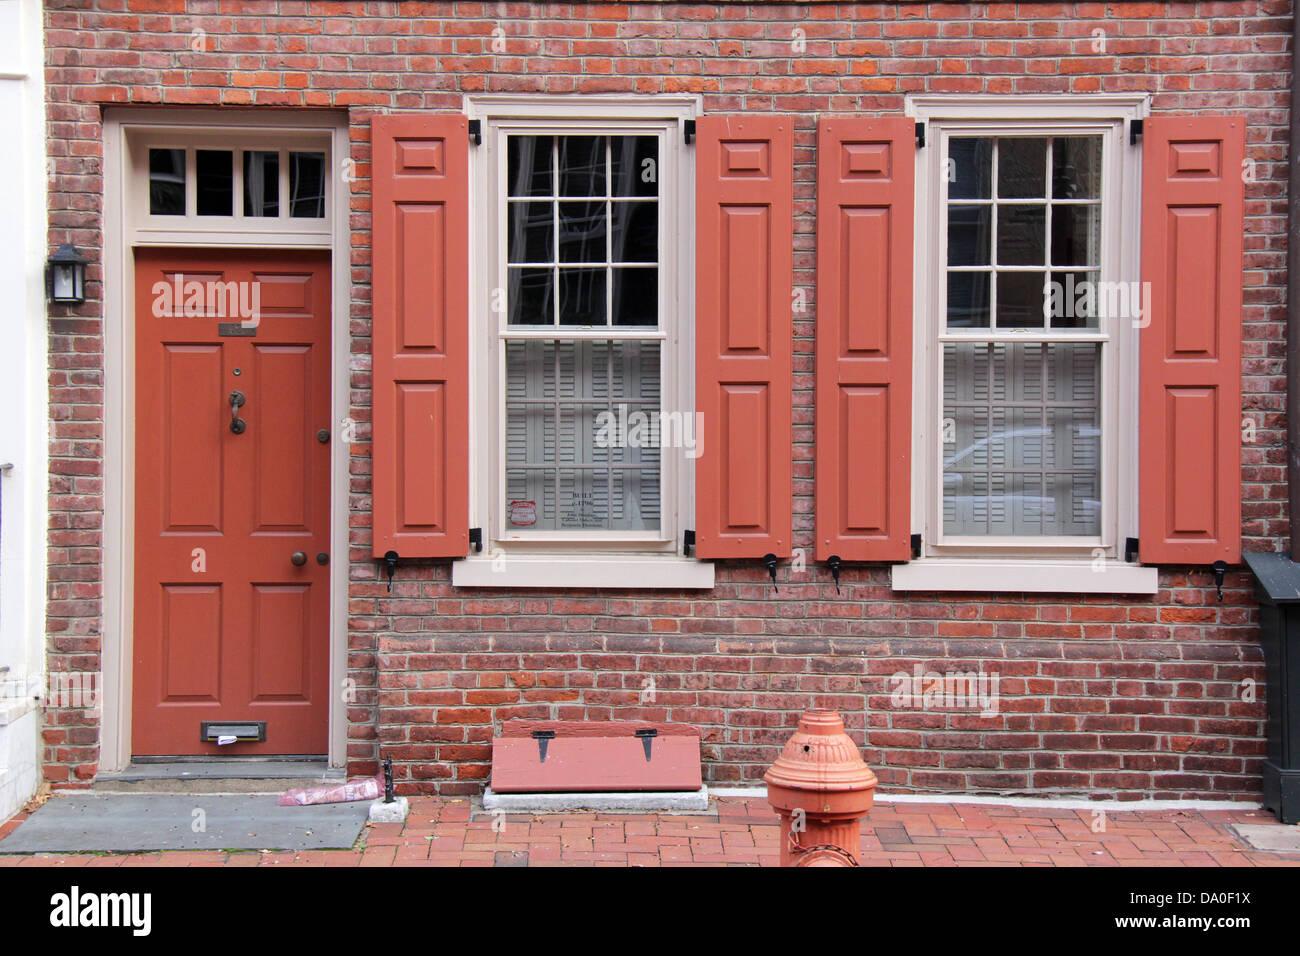 Door and windows of a traditional colonial house in Philadelphia\u0027s Center City Pennsylvania. & Door and windows of a traditional colonial house in Philadelphia\u0027s ...